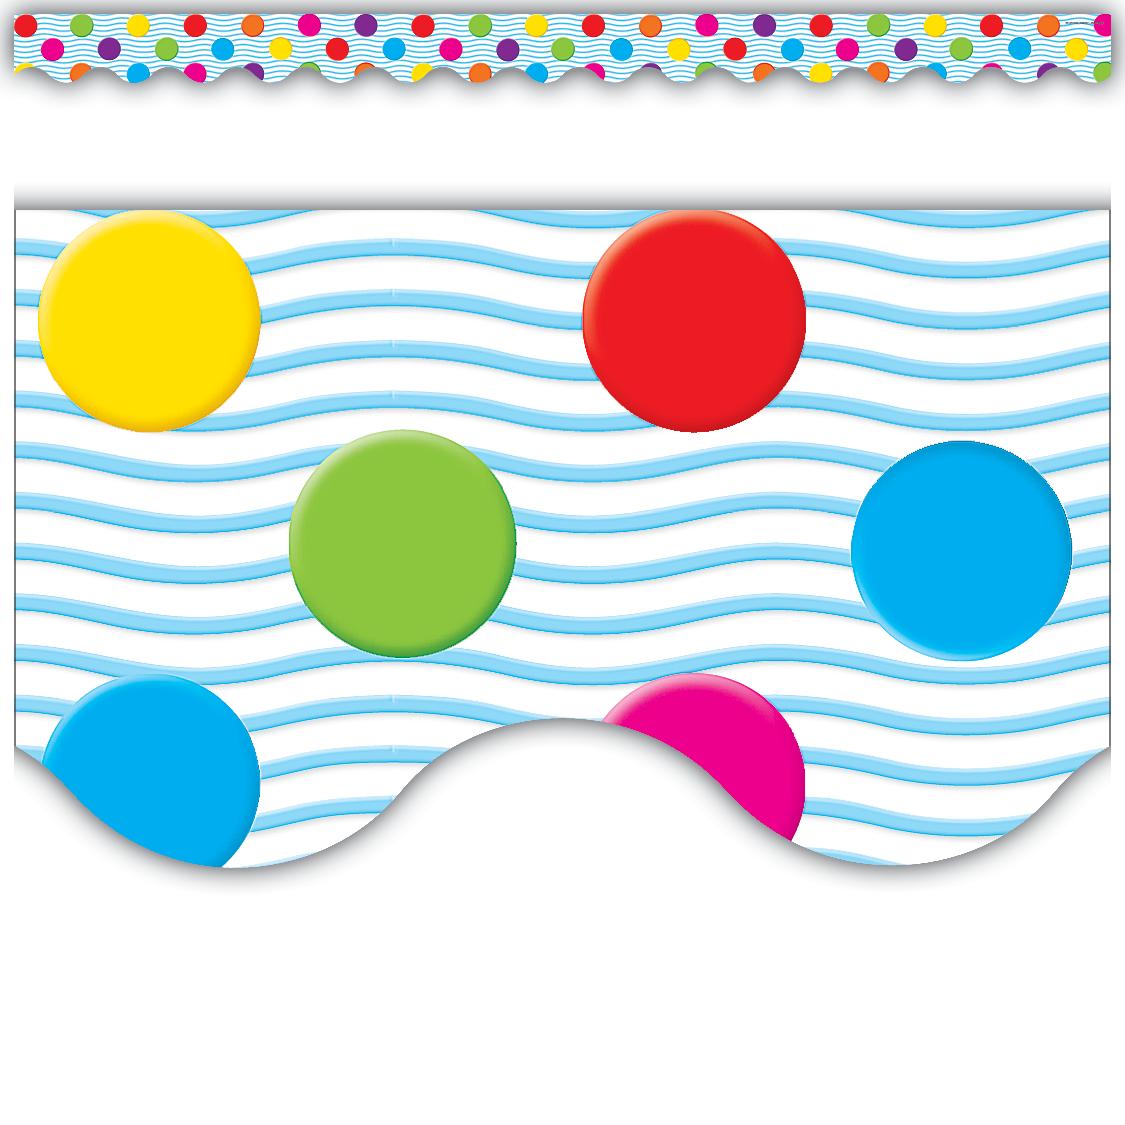 Polka Dot Stickers For Walls Multicolor Polka Dots Scalloped Border Trim Tcr4674